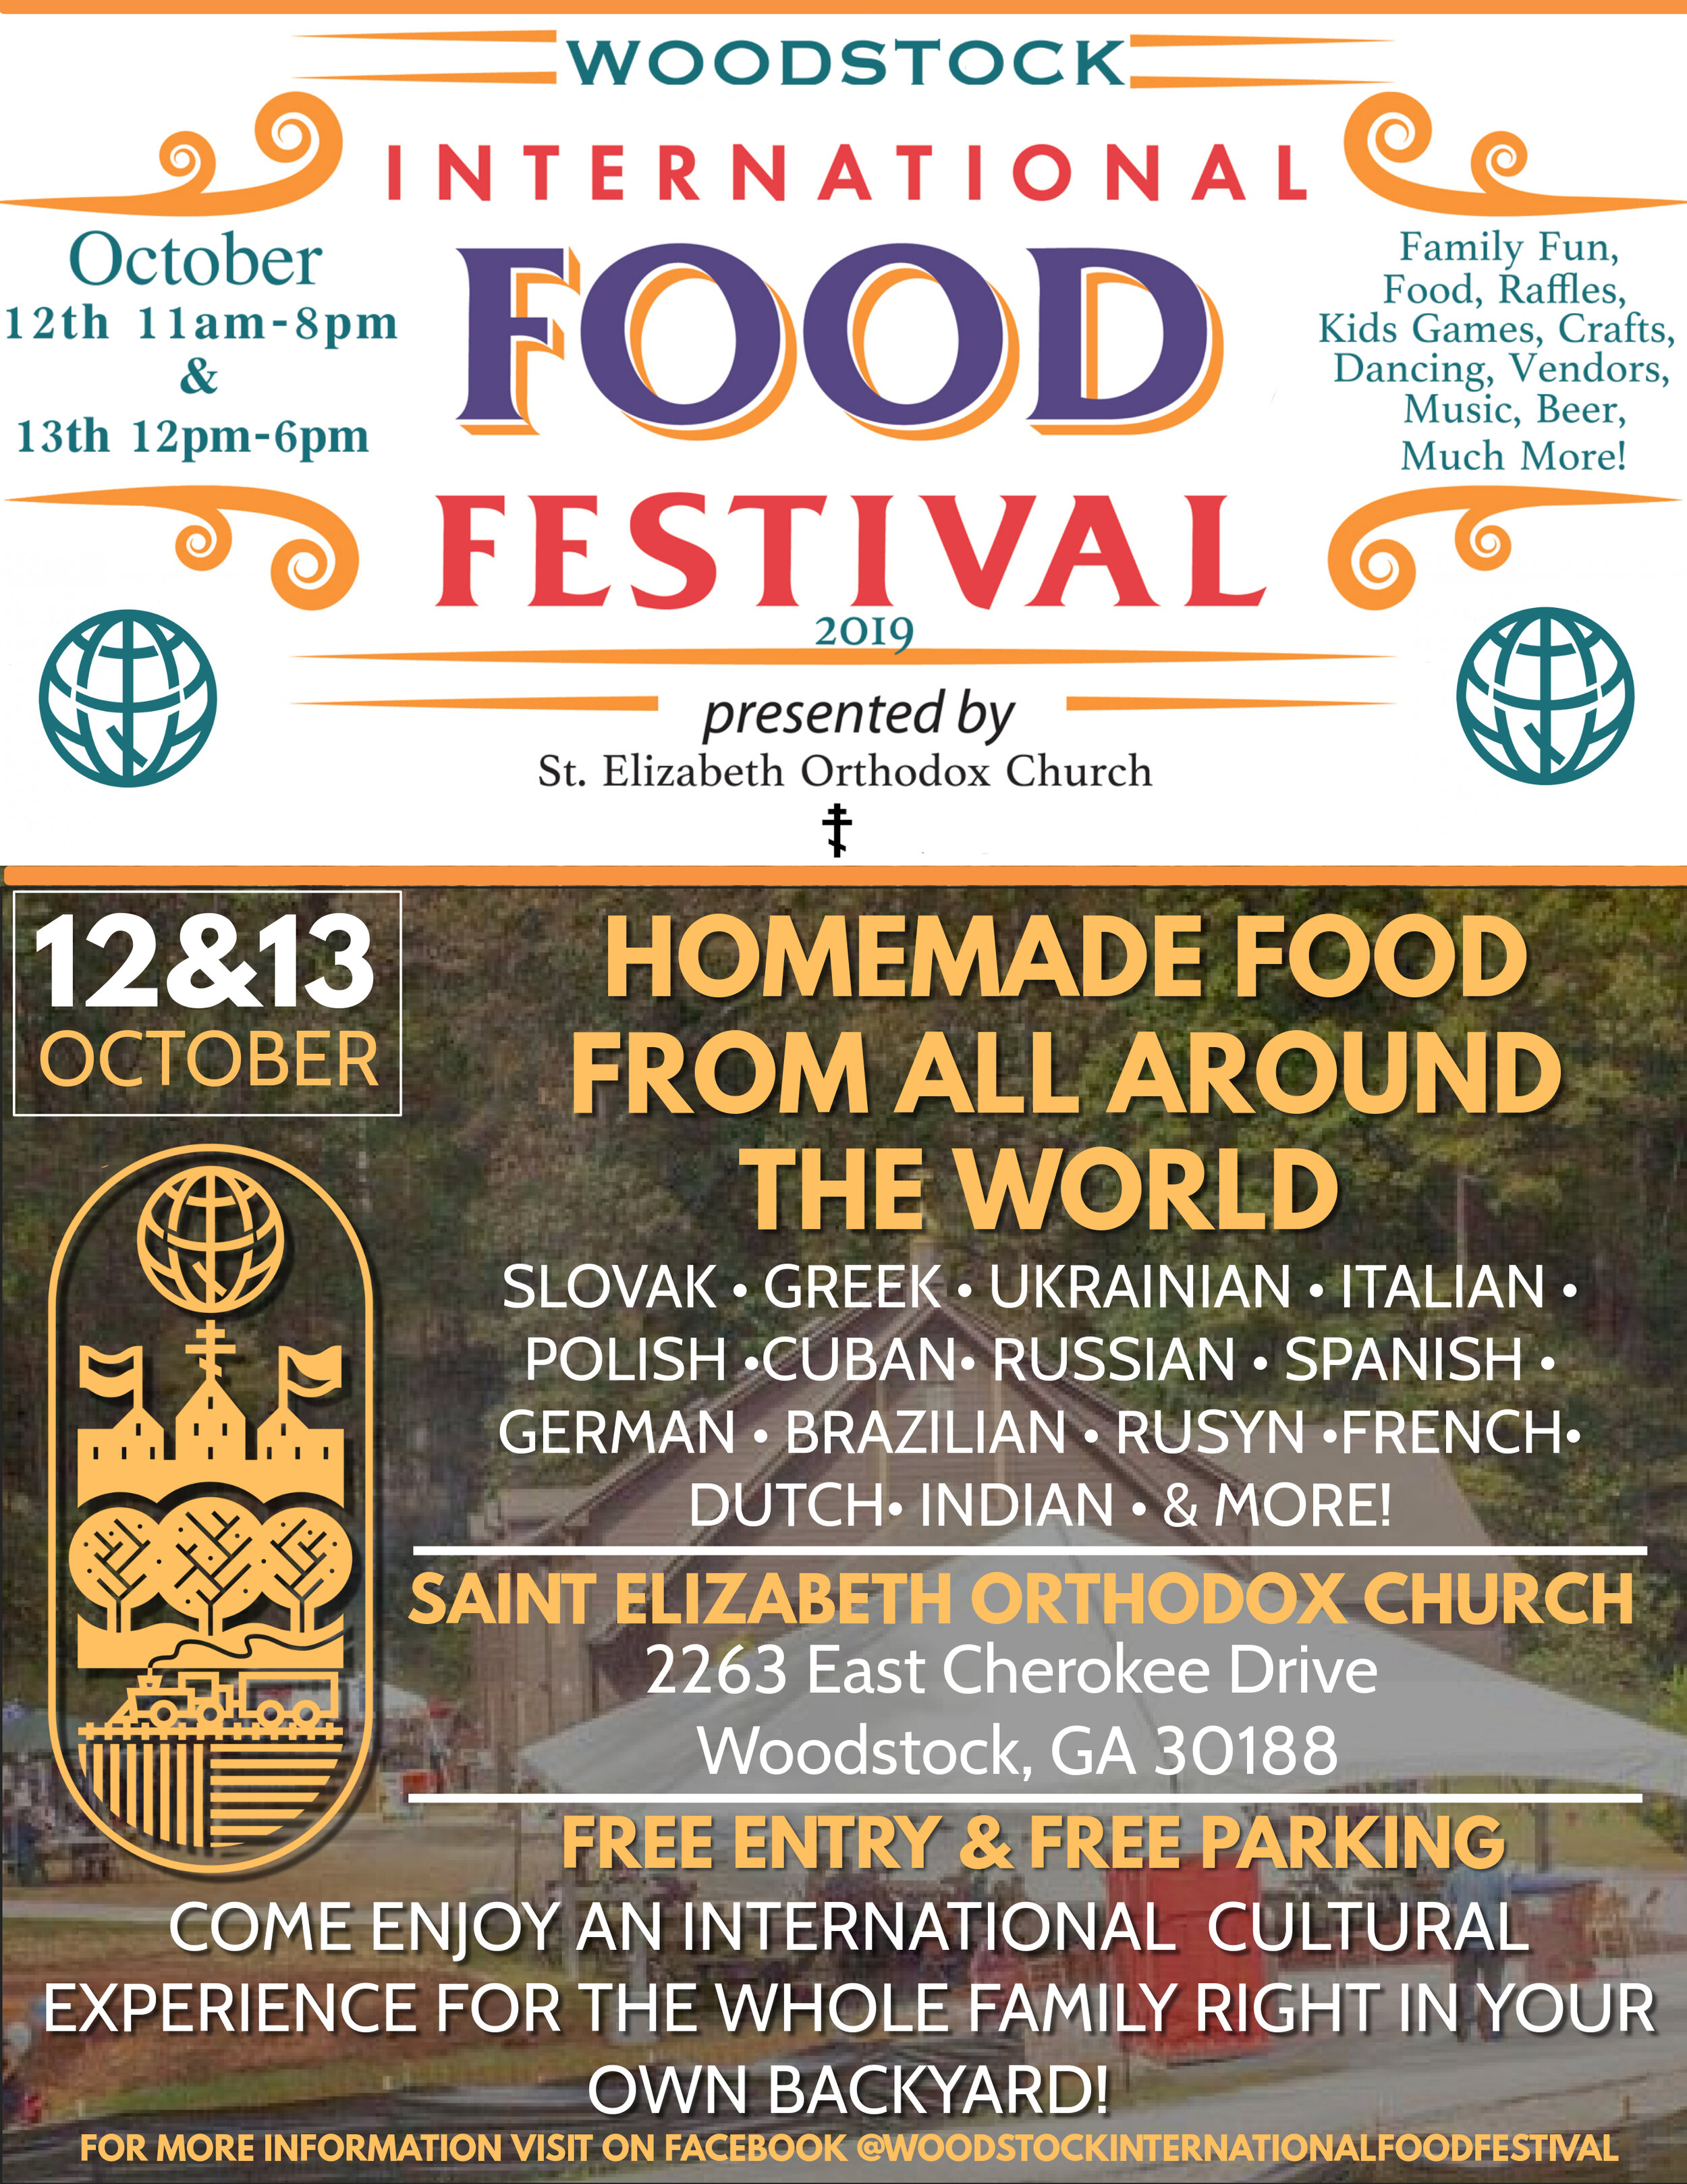 Food Festival Flyer.jpg